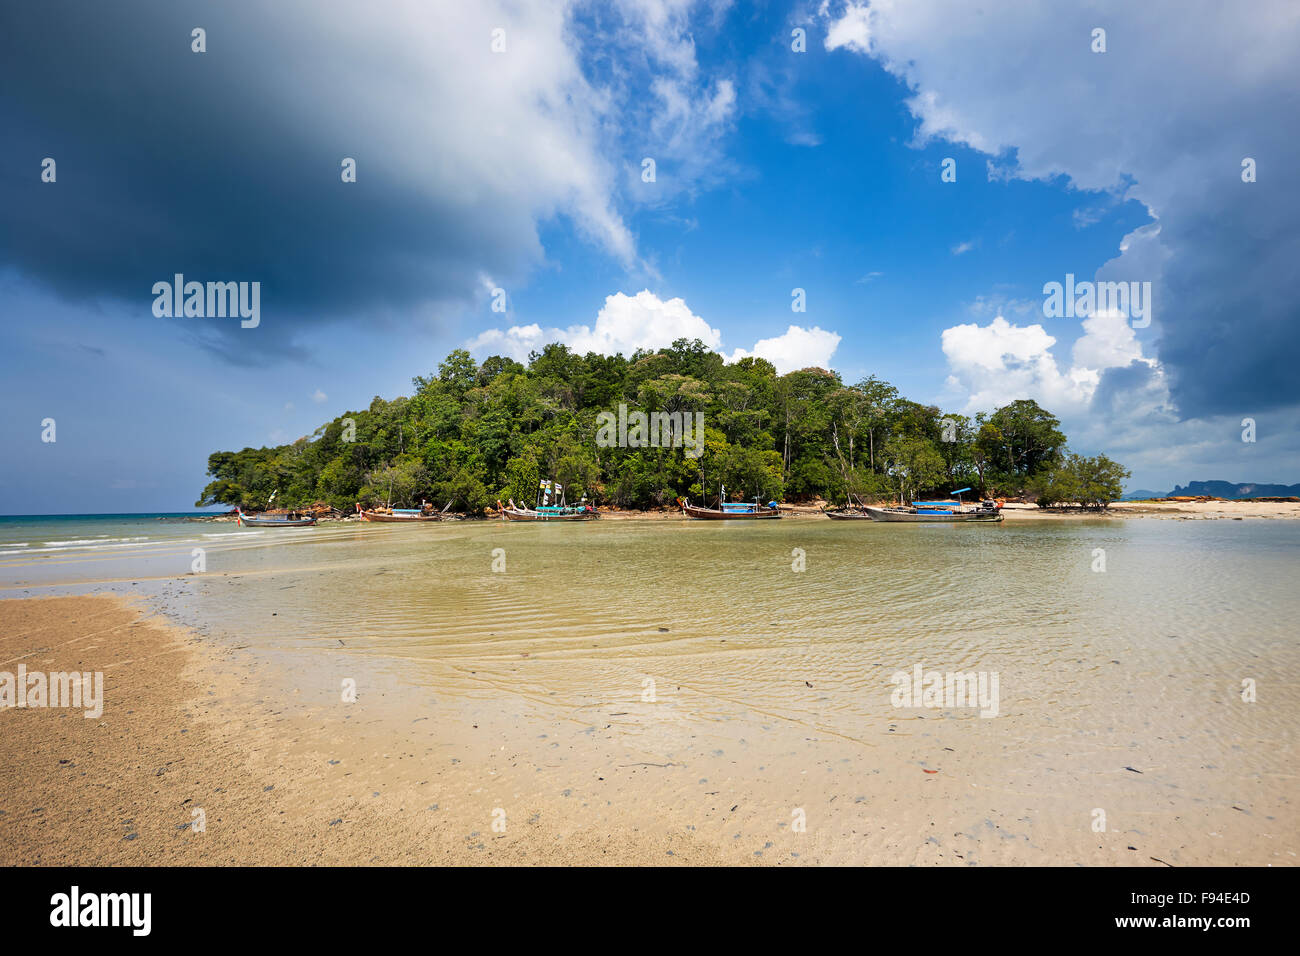 La Playa Klong Muang, provincia de Krabi, Tailandia. Foto de stock